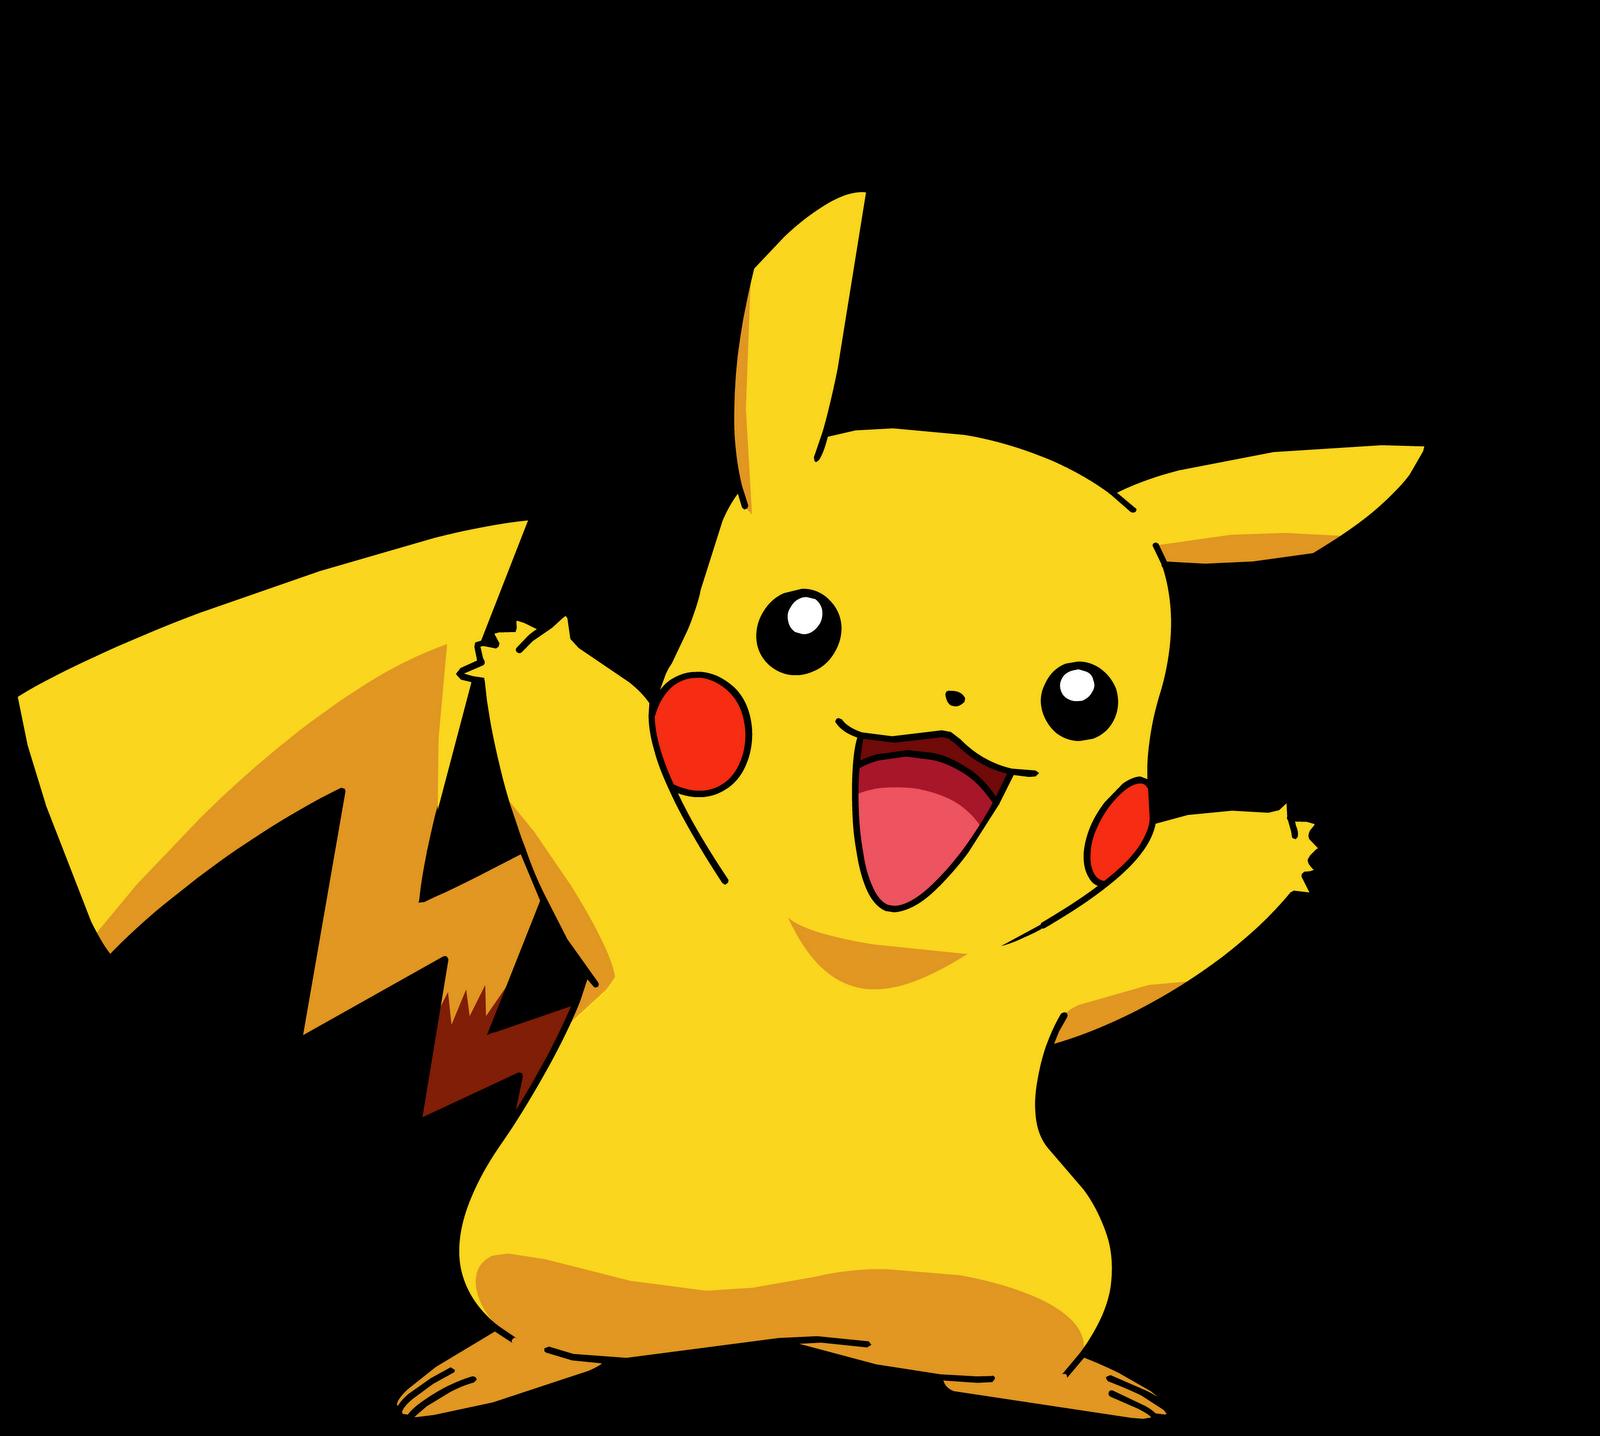 Pokemon Png image #18182 - Pokemon PNG